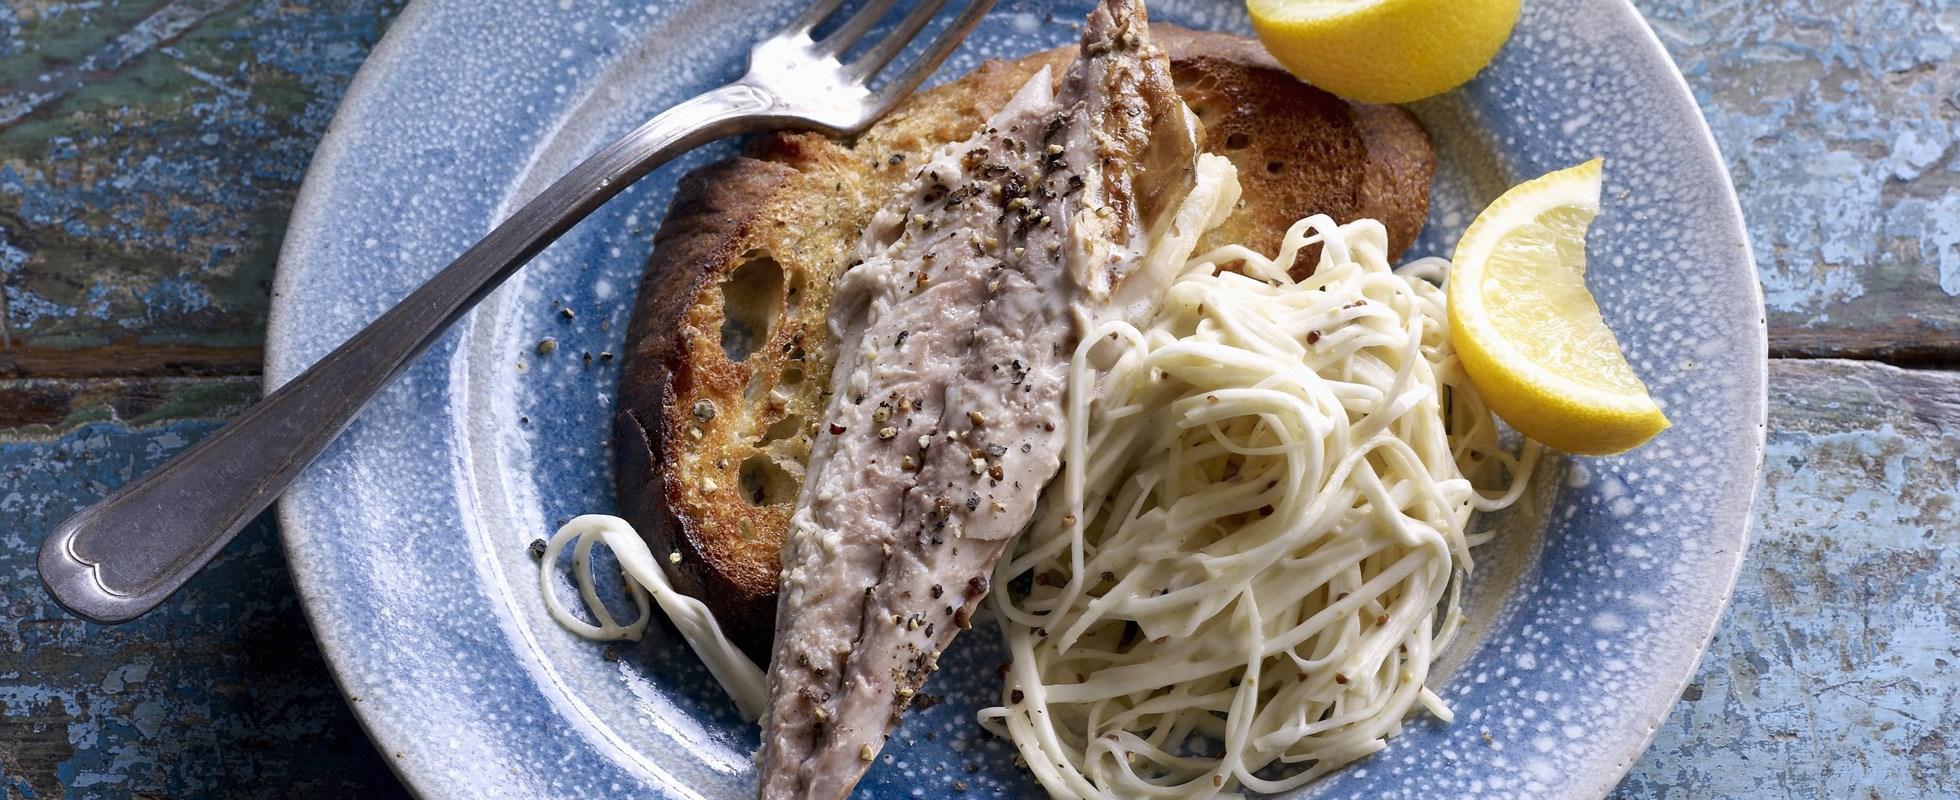 Celeriac remoulade with warm smoked mackerel